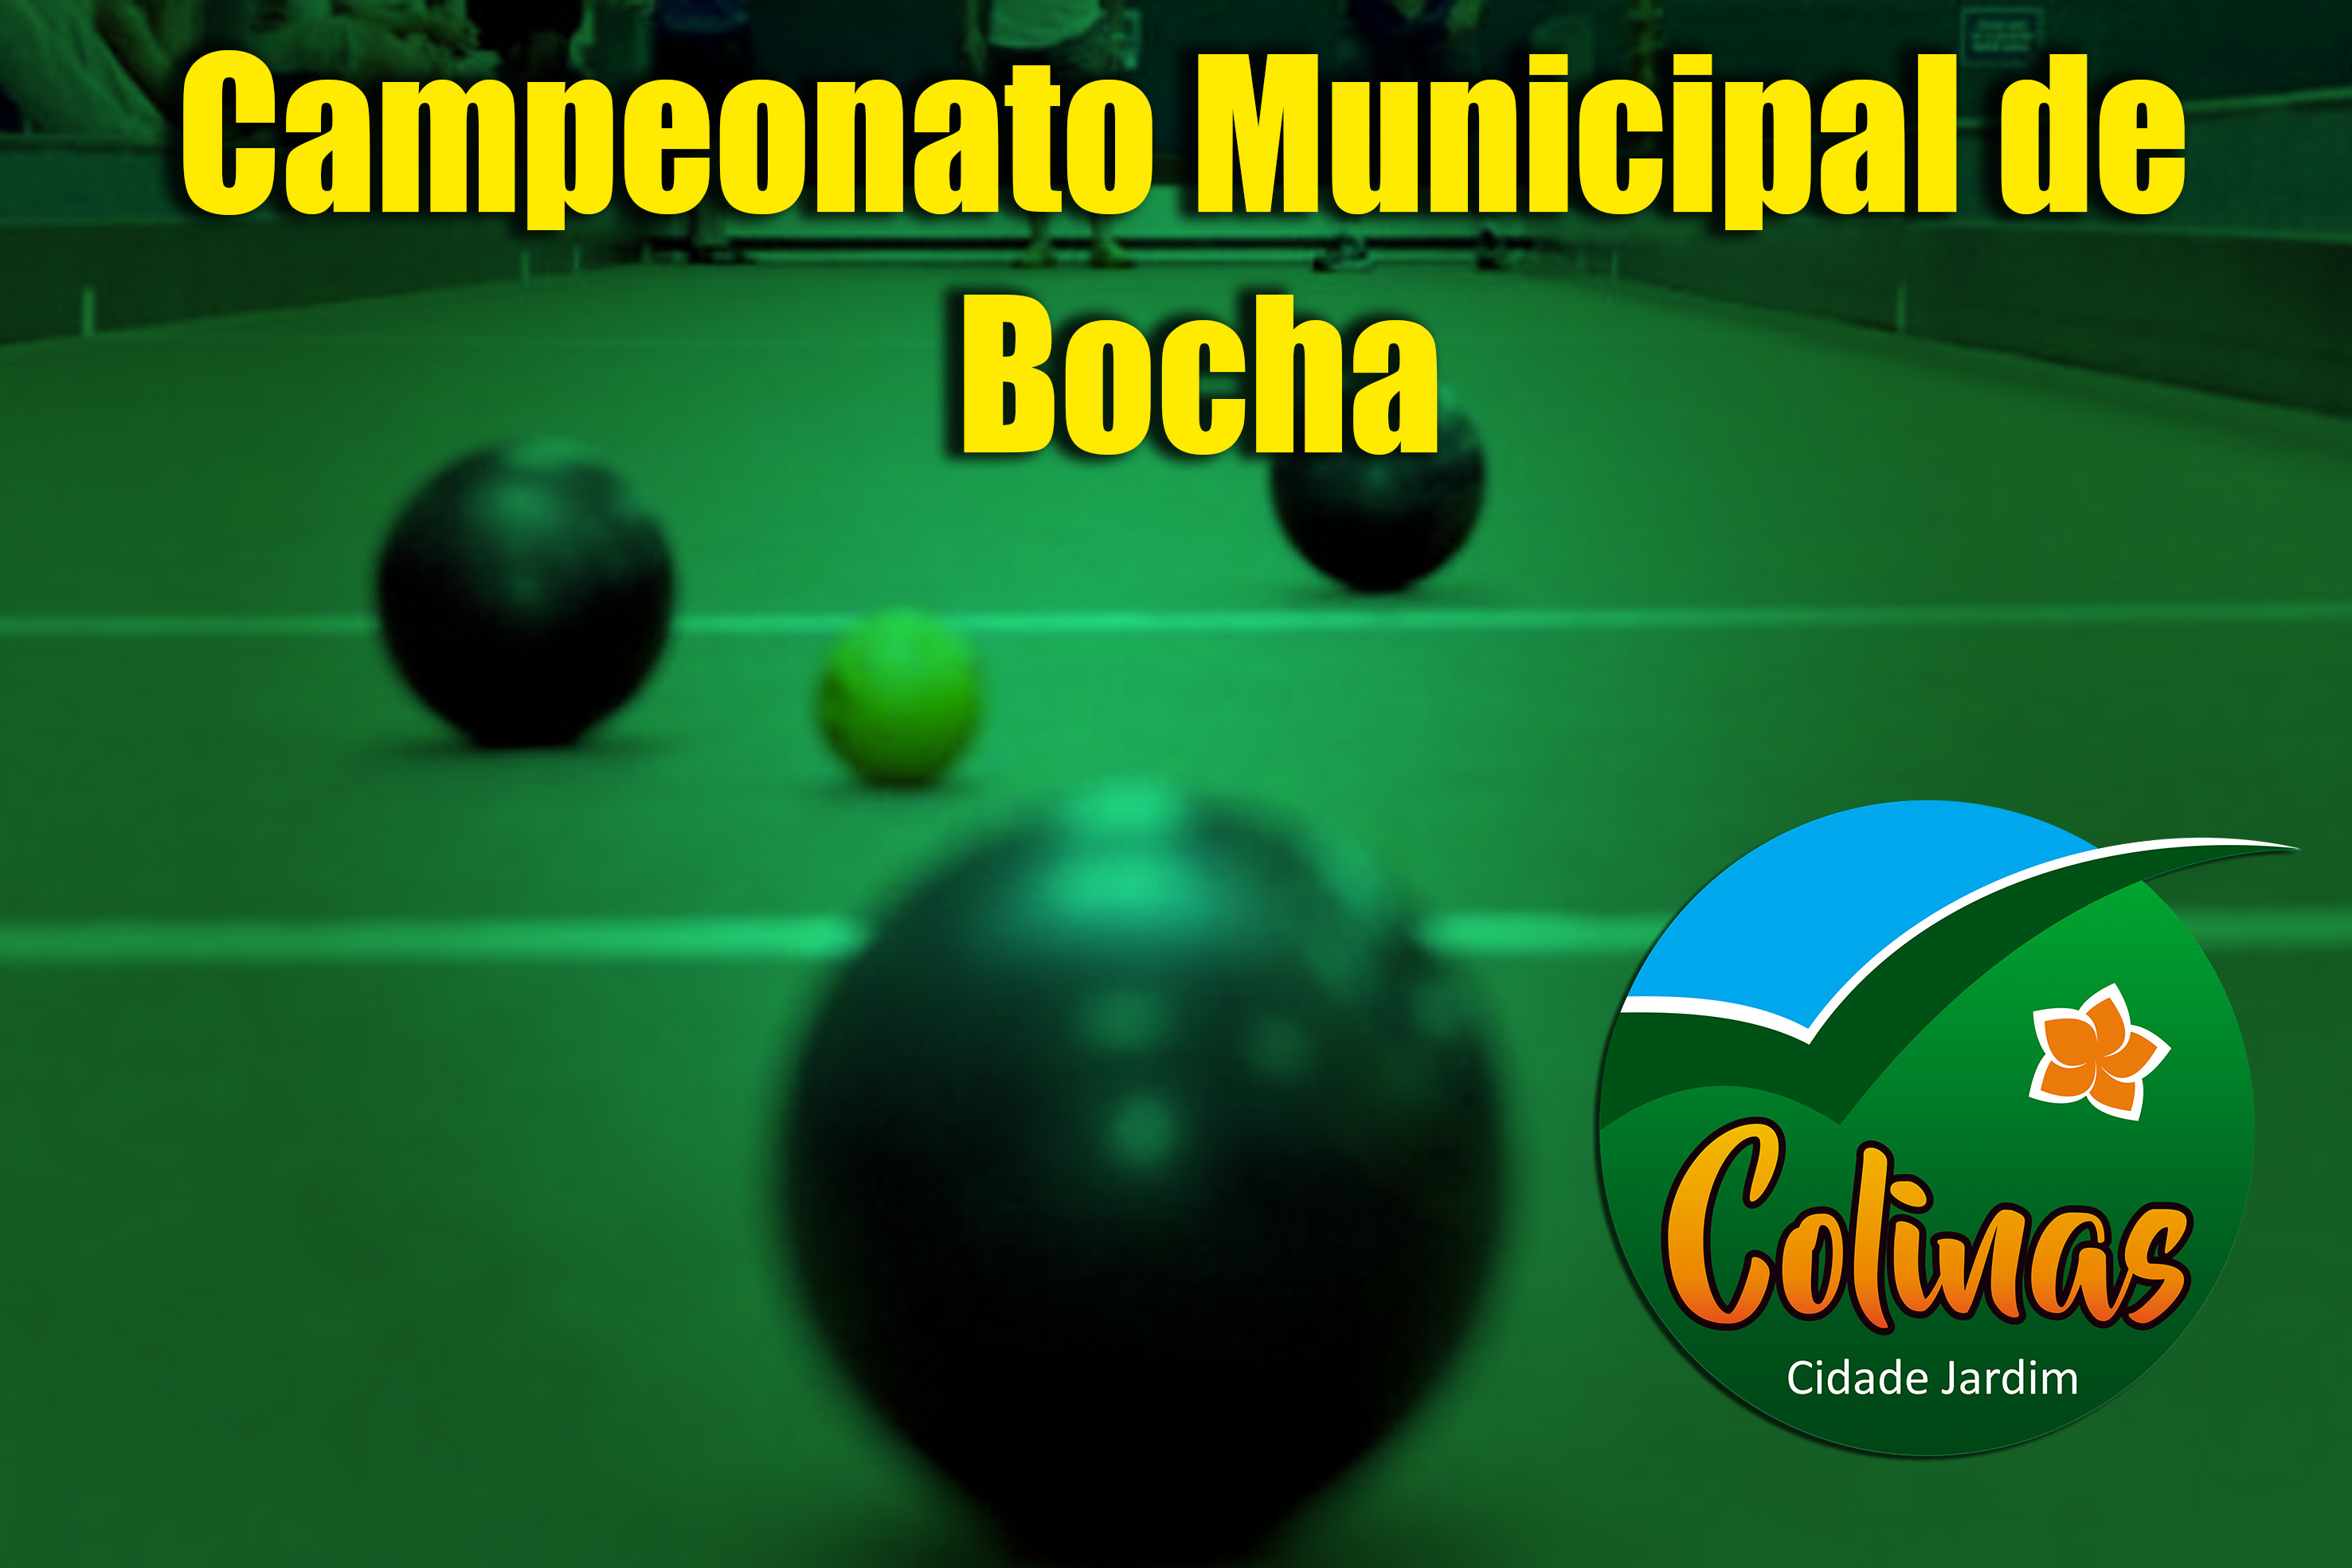 Campeonato Municipal Interbairros de Bocha começa a...